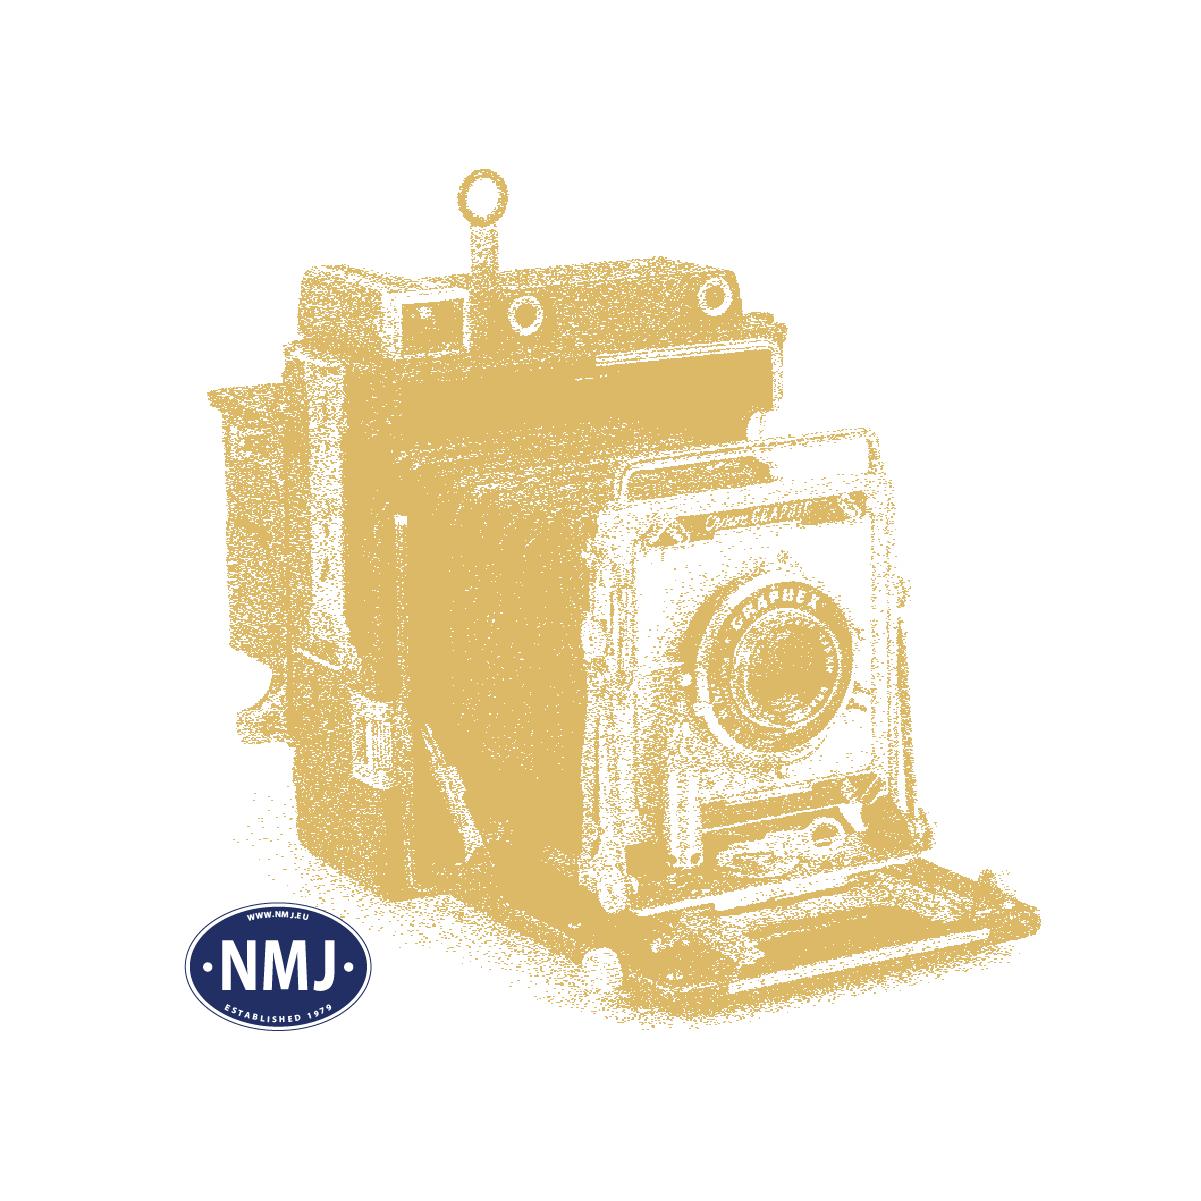 NMJB1119 - Fähr-Haken, 10 Stück